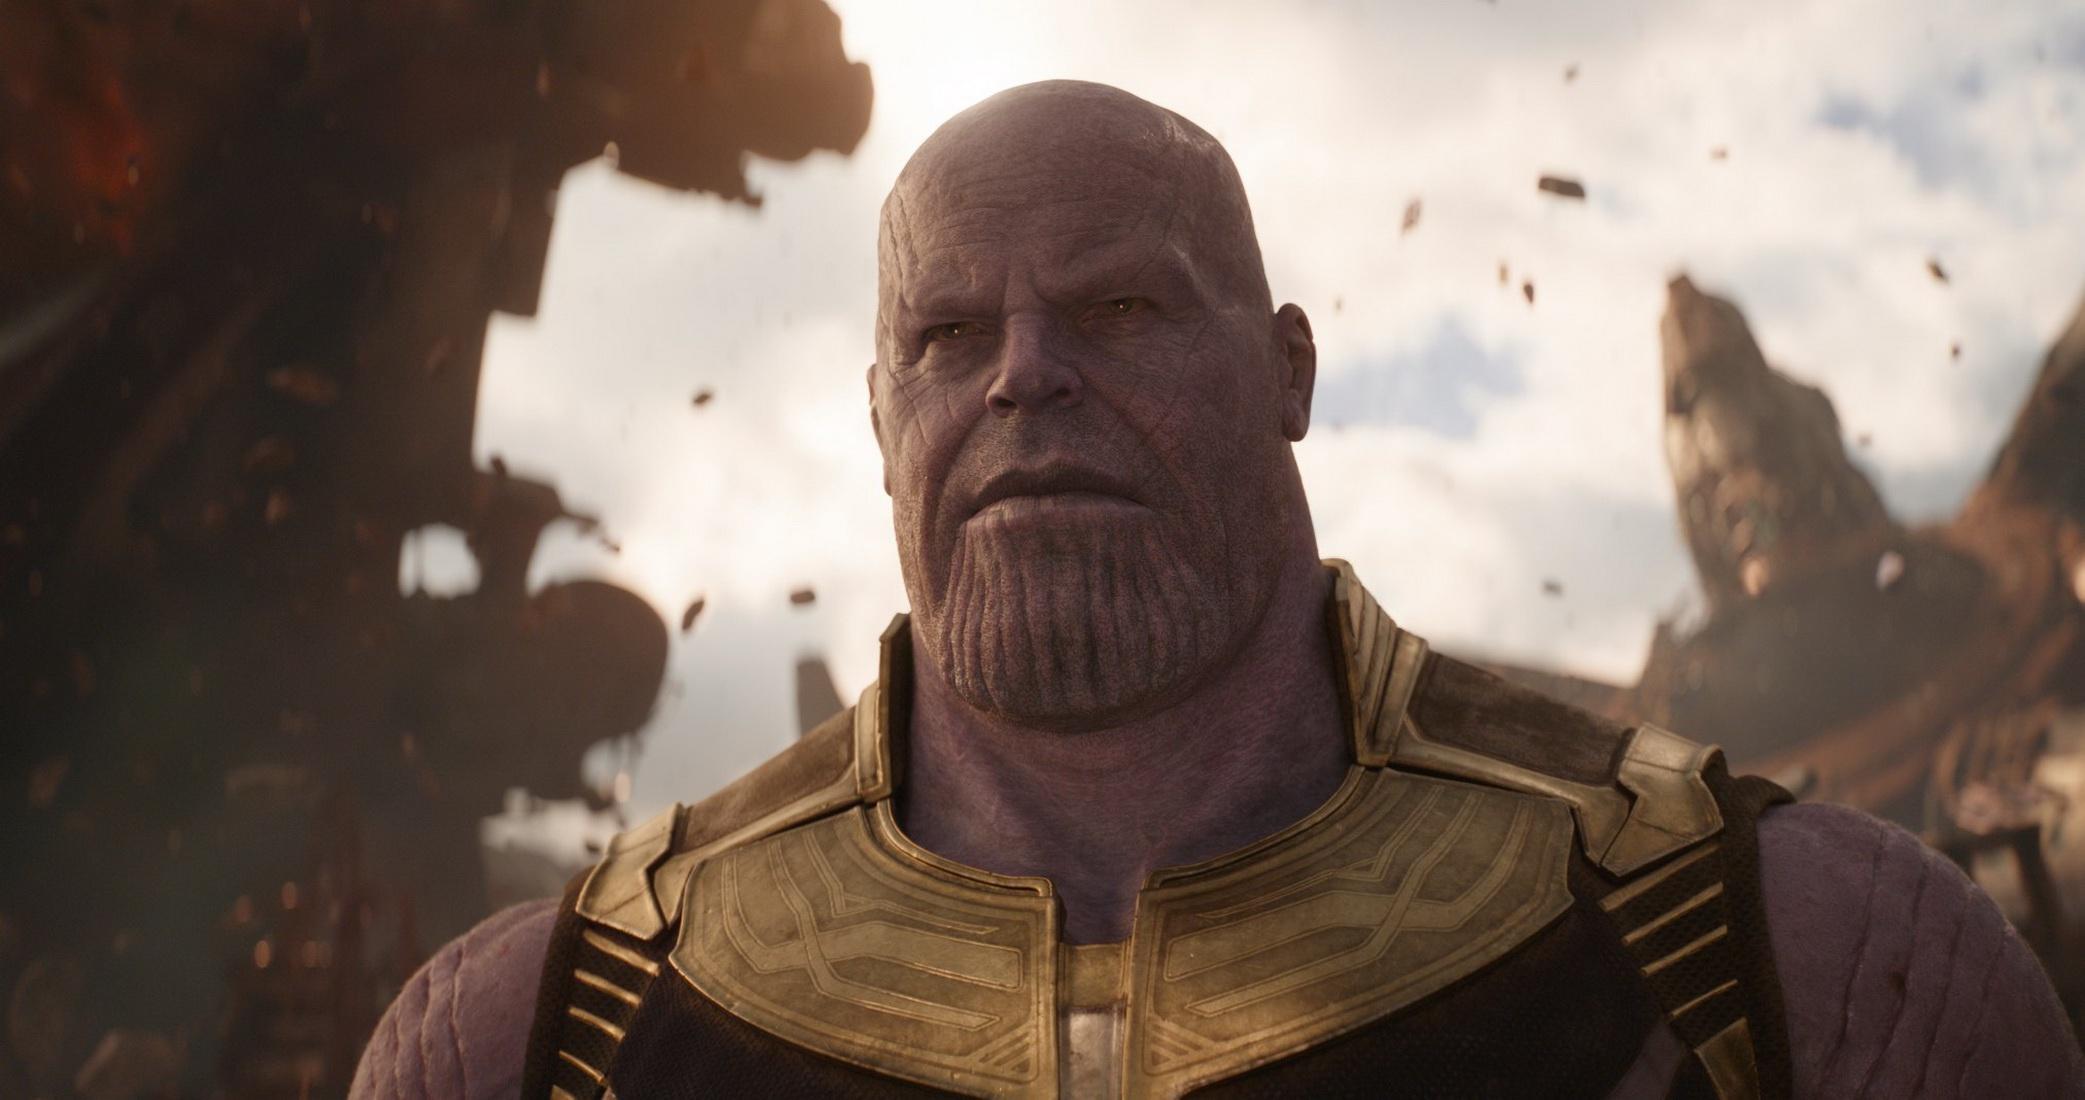 3d Wallpaper For Mobile 480x800 1920x1080 Josh Brolin As Thanos In Avengers Infinity War